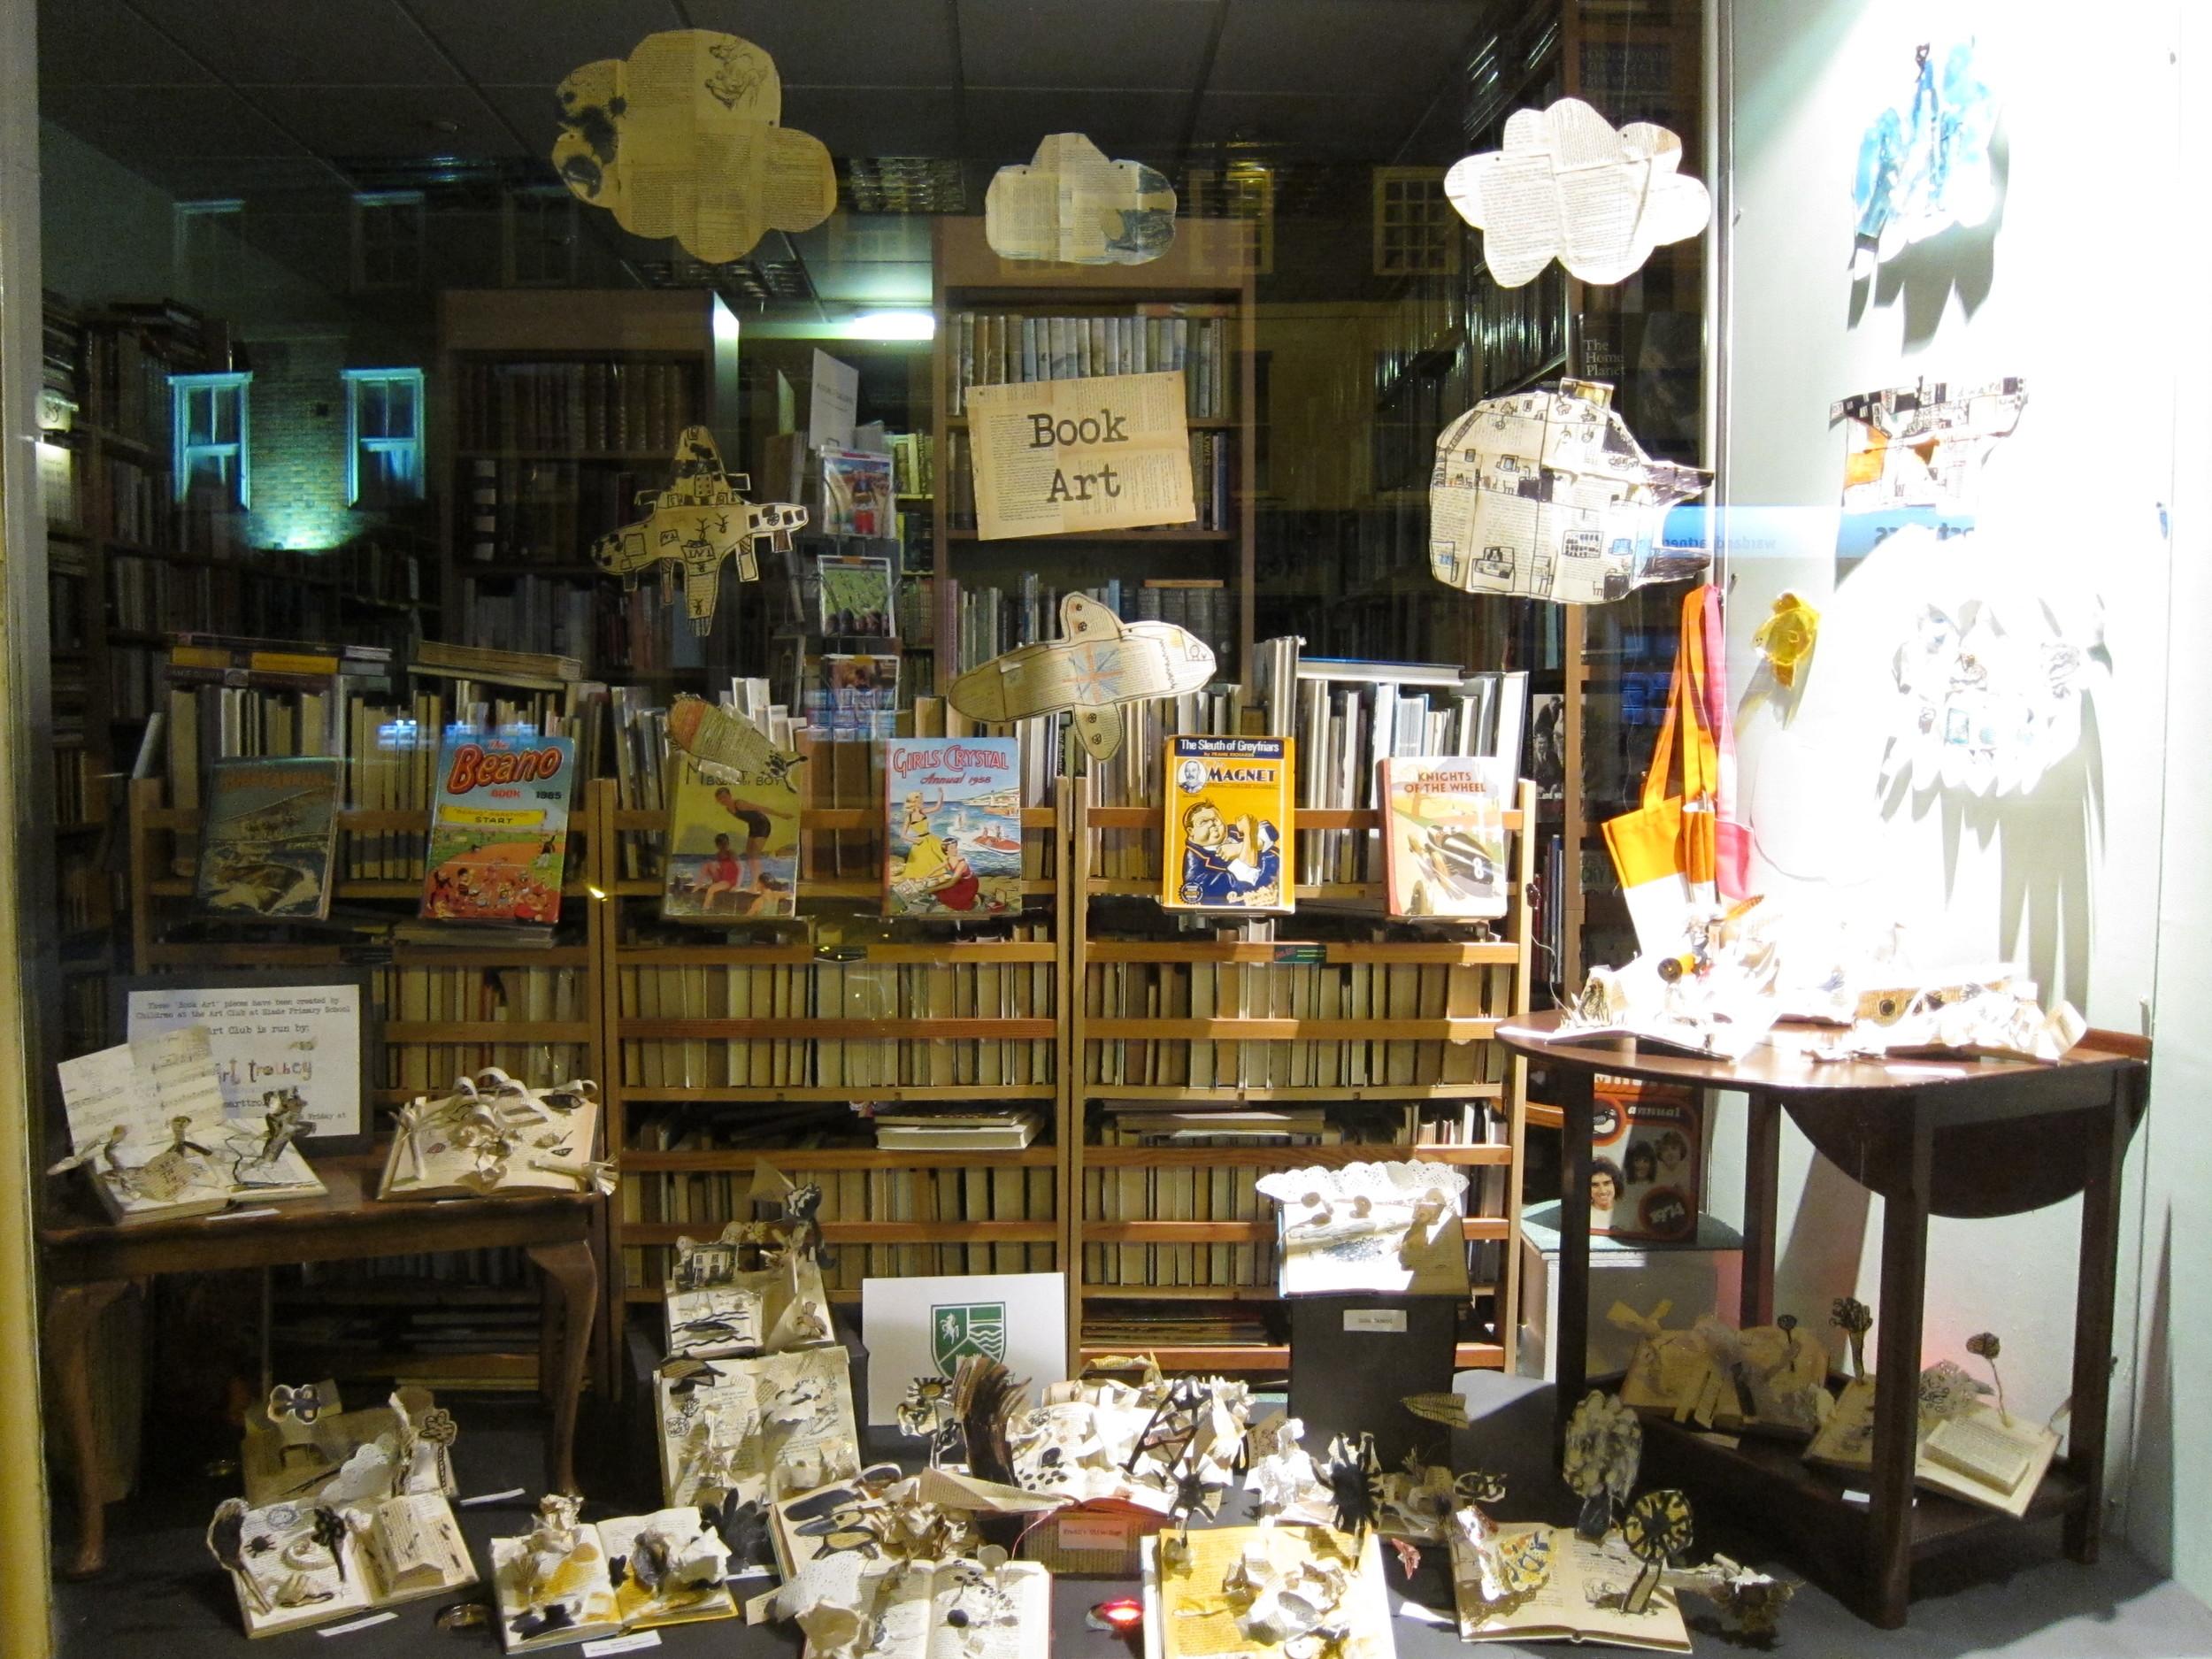 mr book window-2.JPG